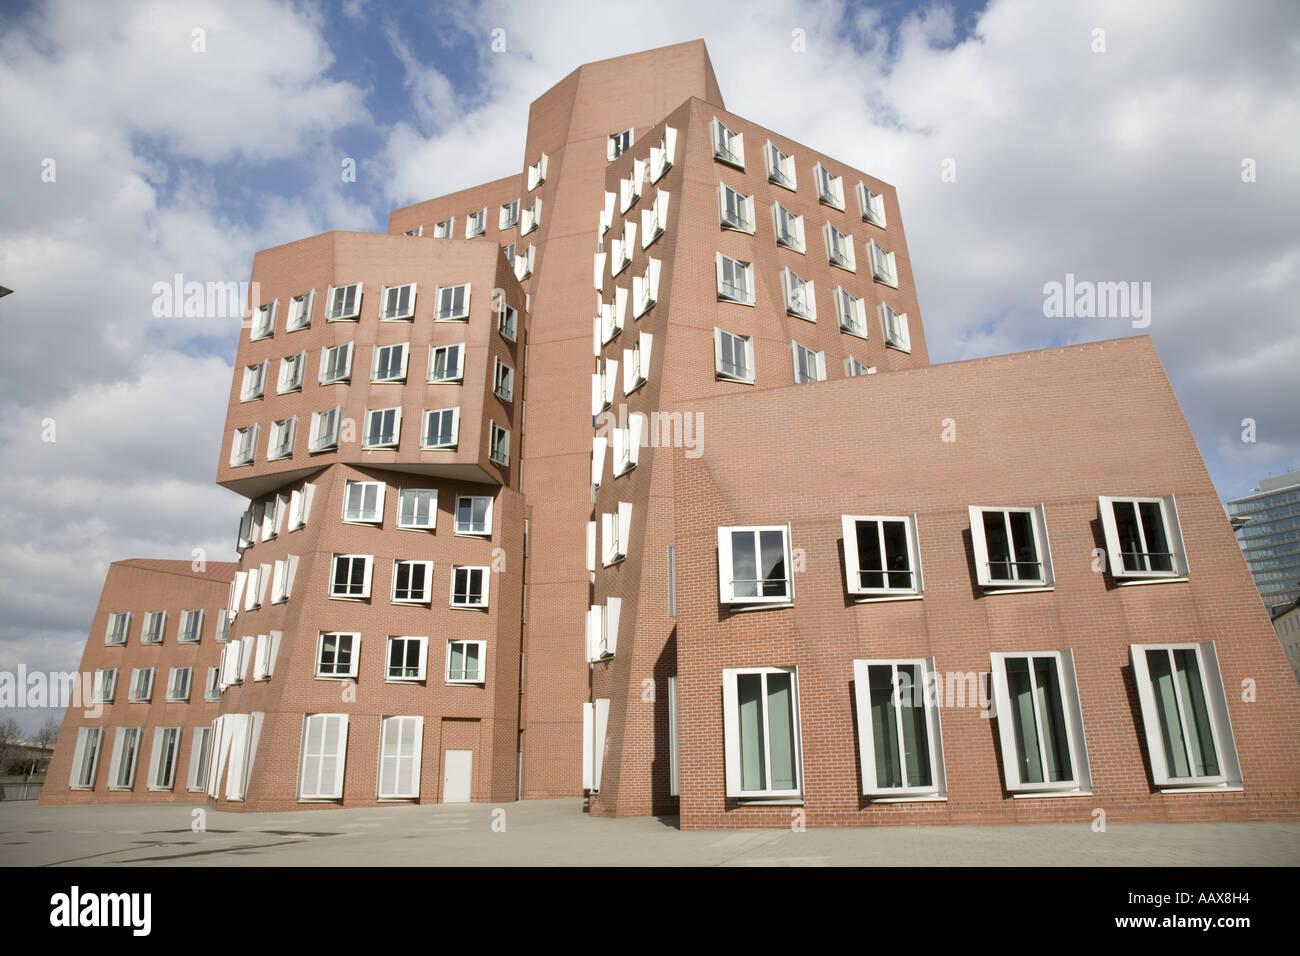 Medienhafen, Neuer Zollhof, Düsseldorf, Germany Dusseldorf, Duesseldorf, Designed by Frank Gehry - Stock Image